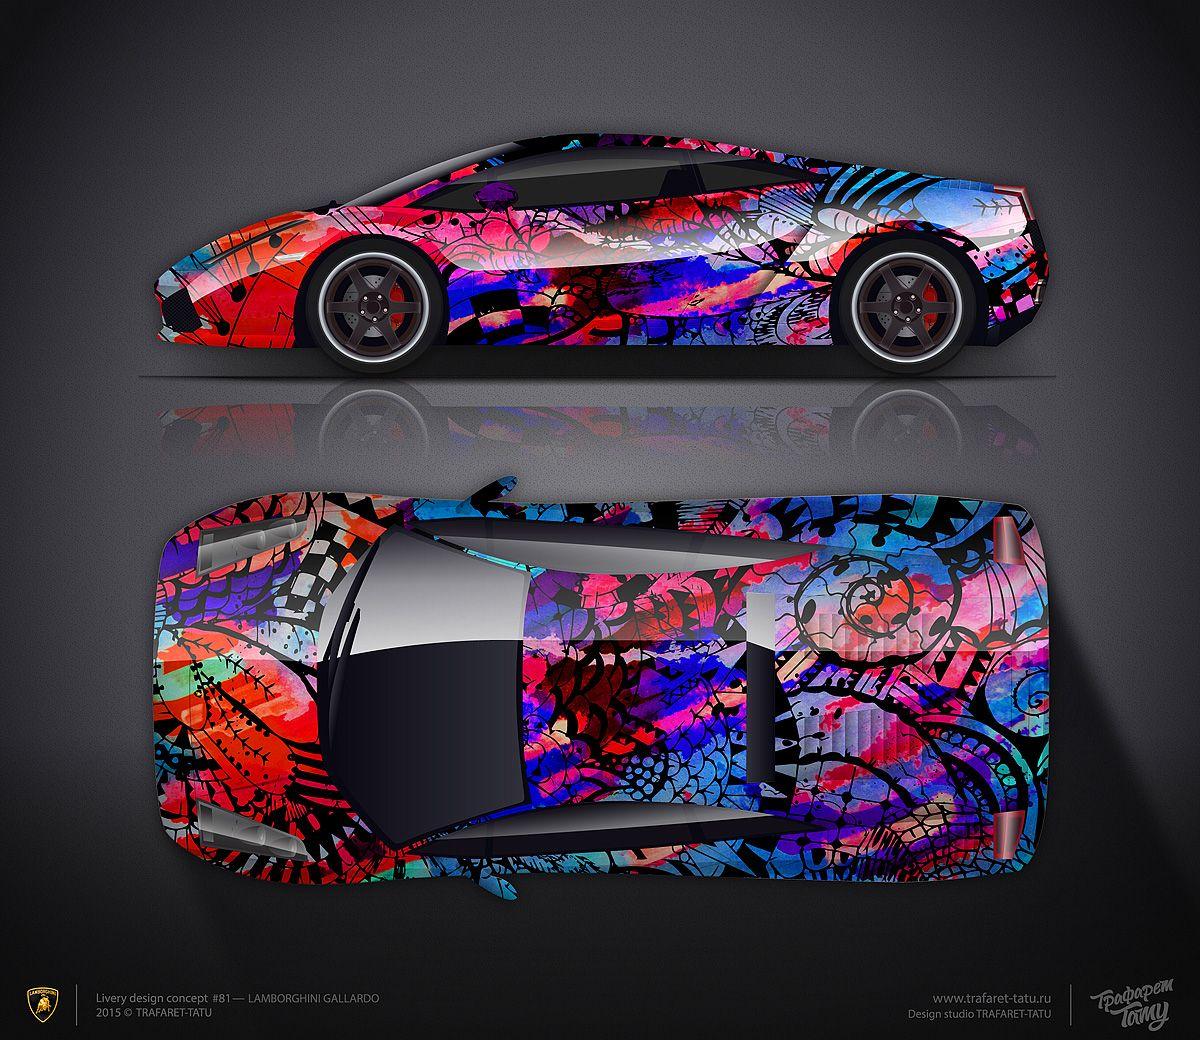 Design consept #8 Lamborghini Gallardo